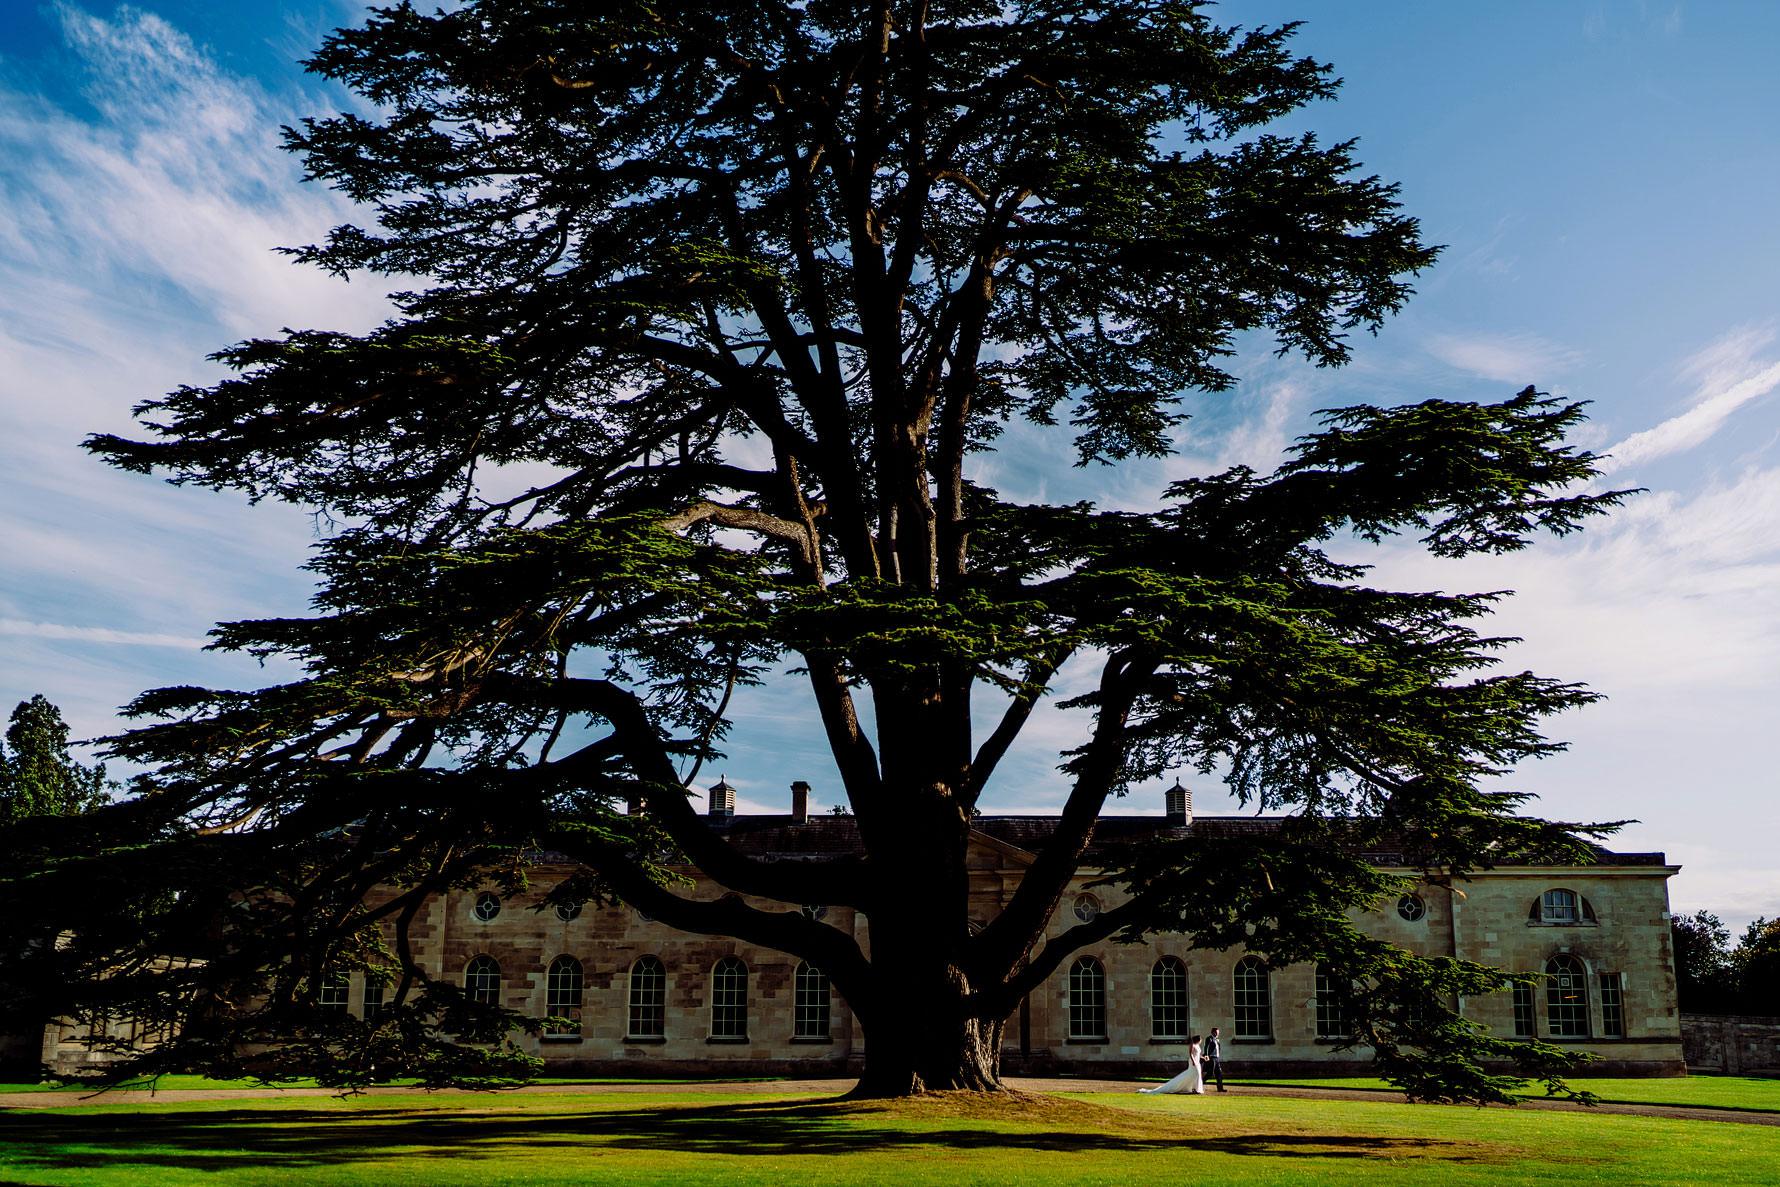 Woburn abbey photo